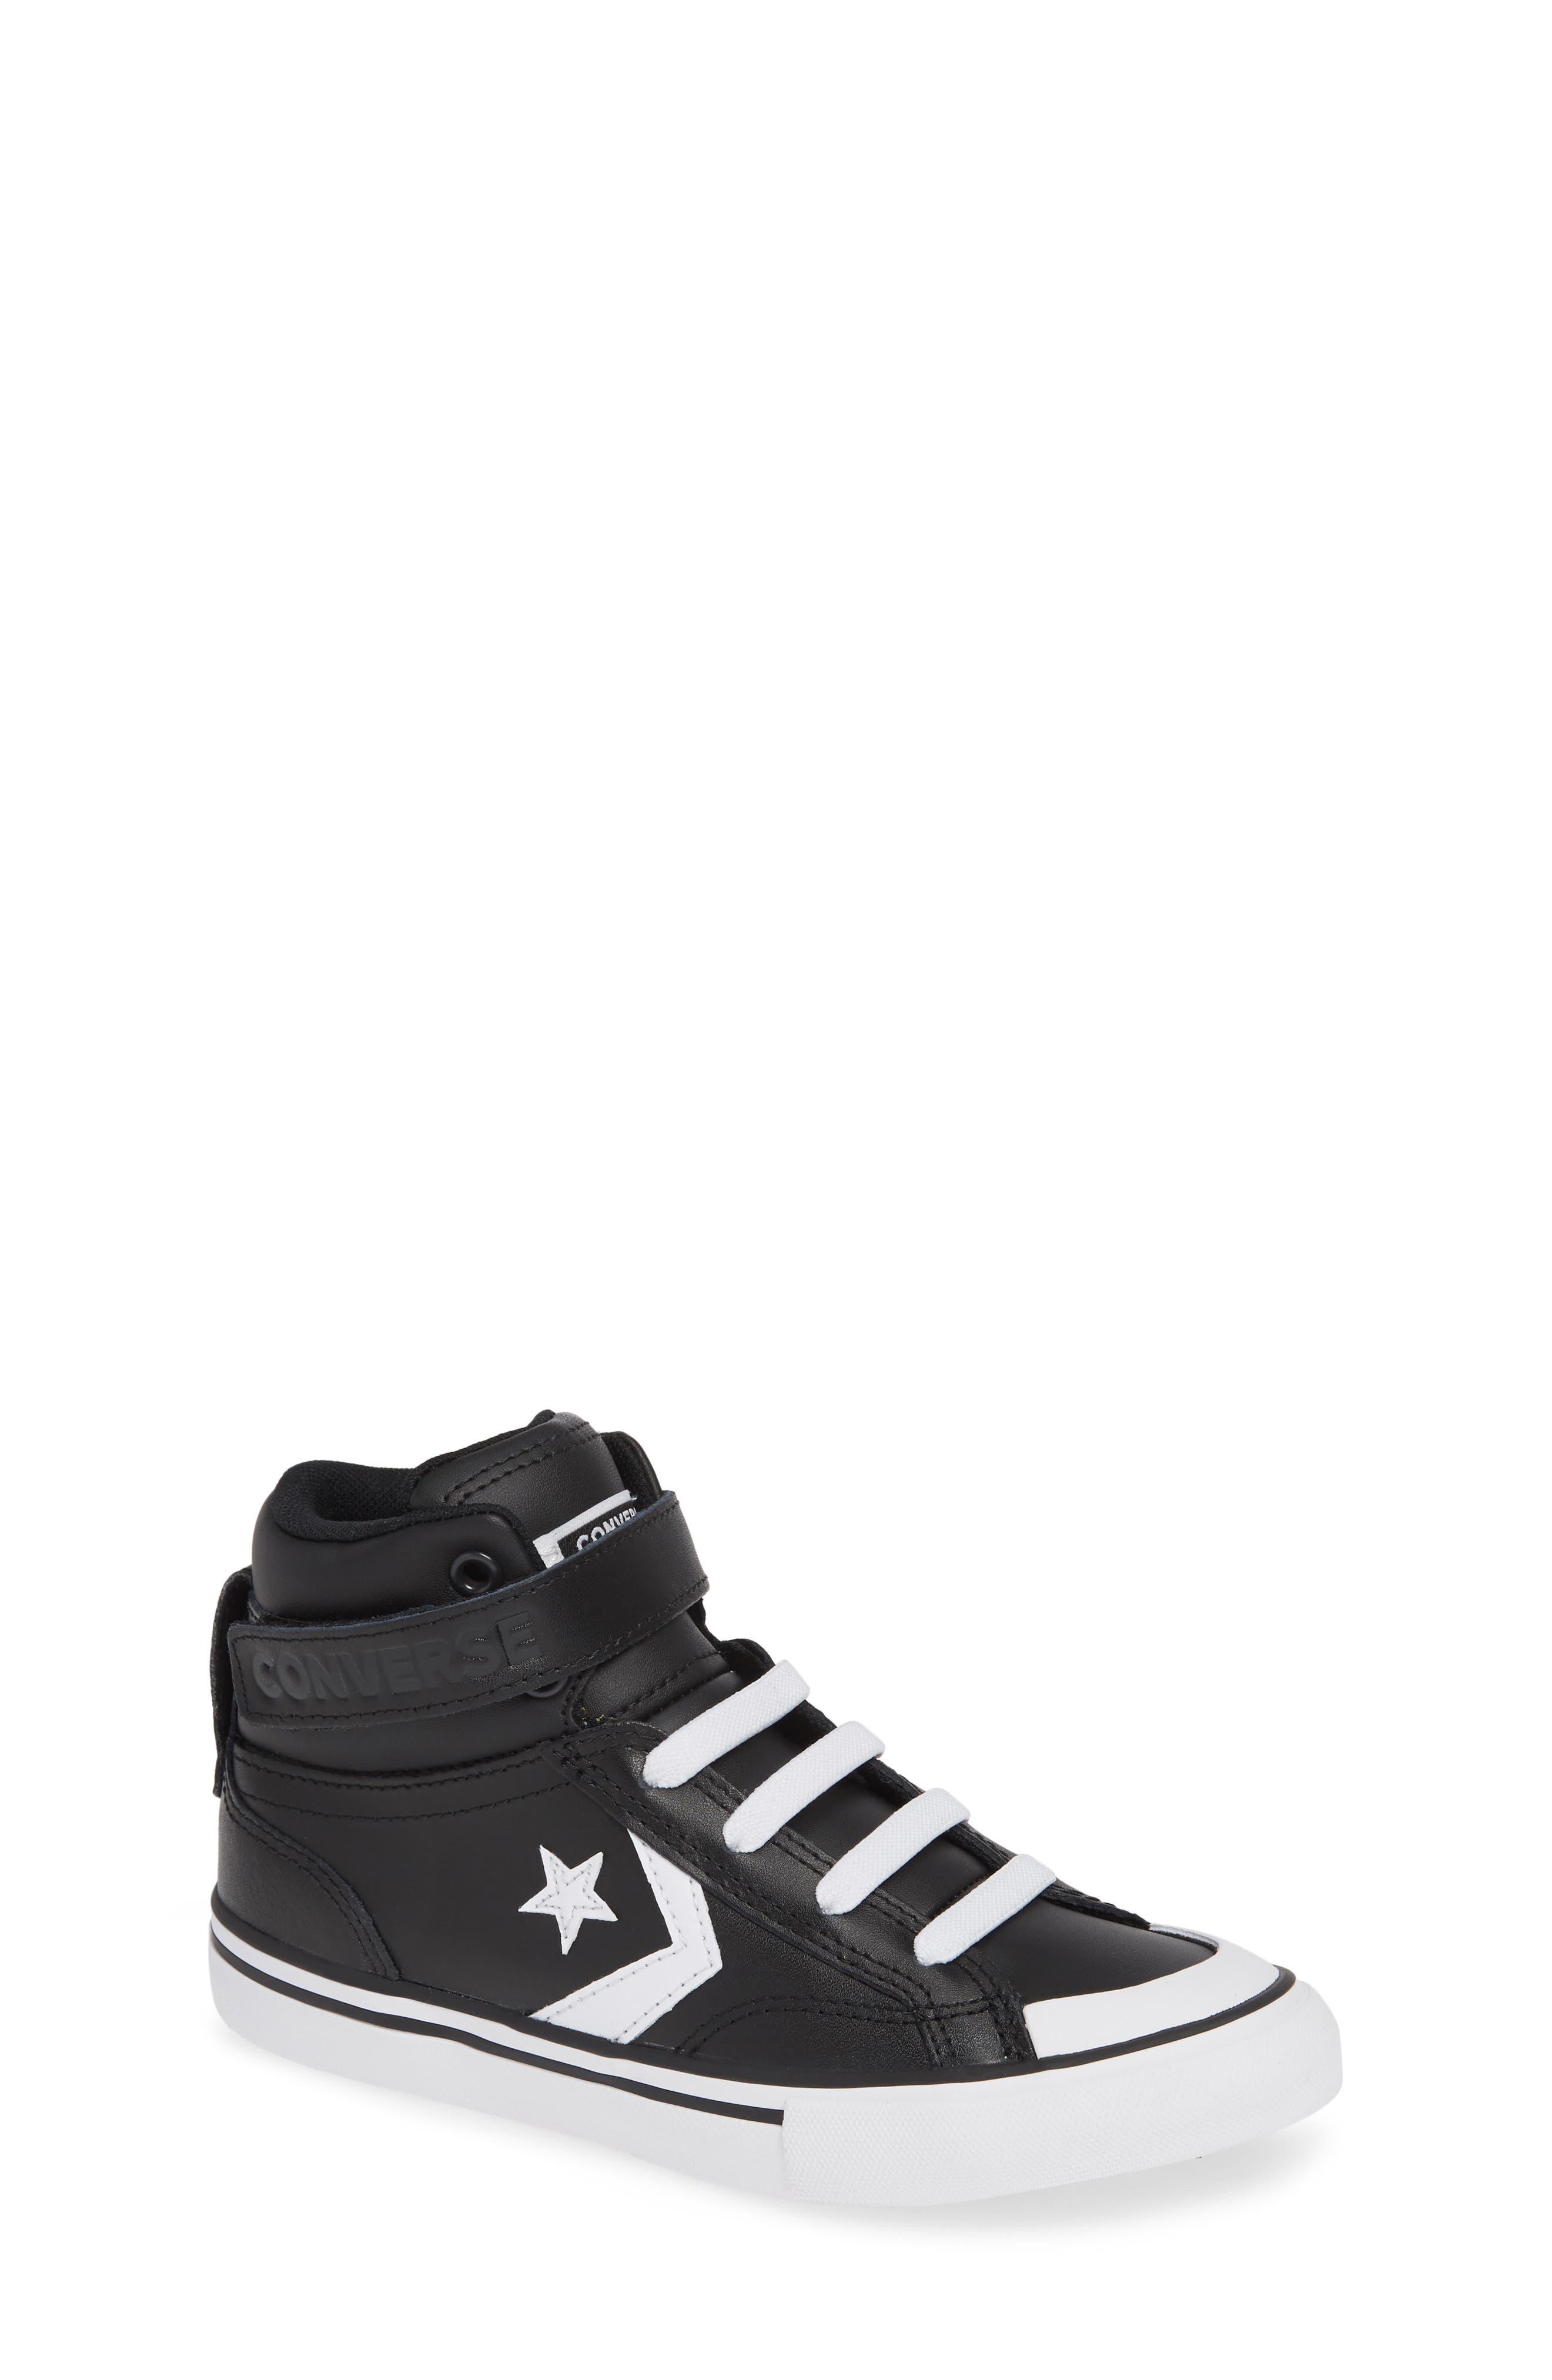 CONVERSE Pro Blaze High Top Sneaker, Main, color, BLACK/ WHITE/ WHITE